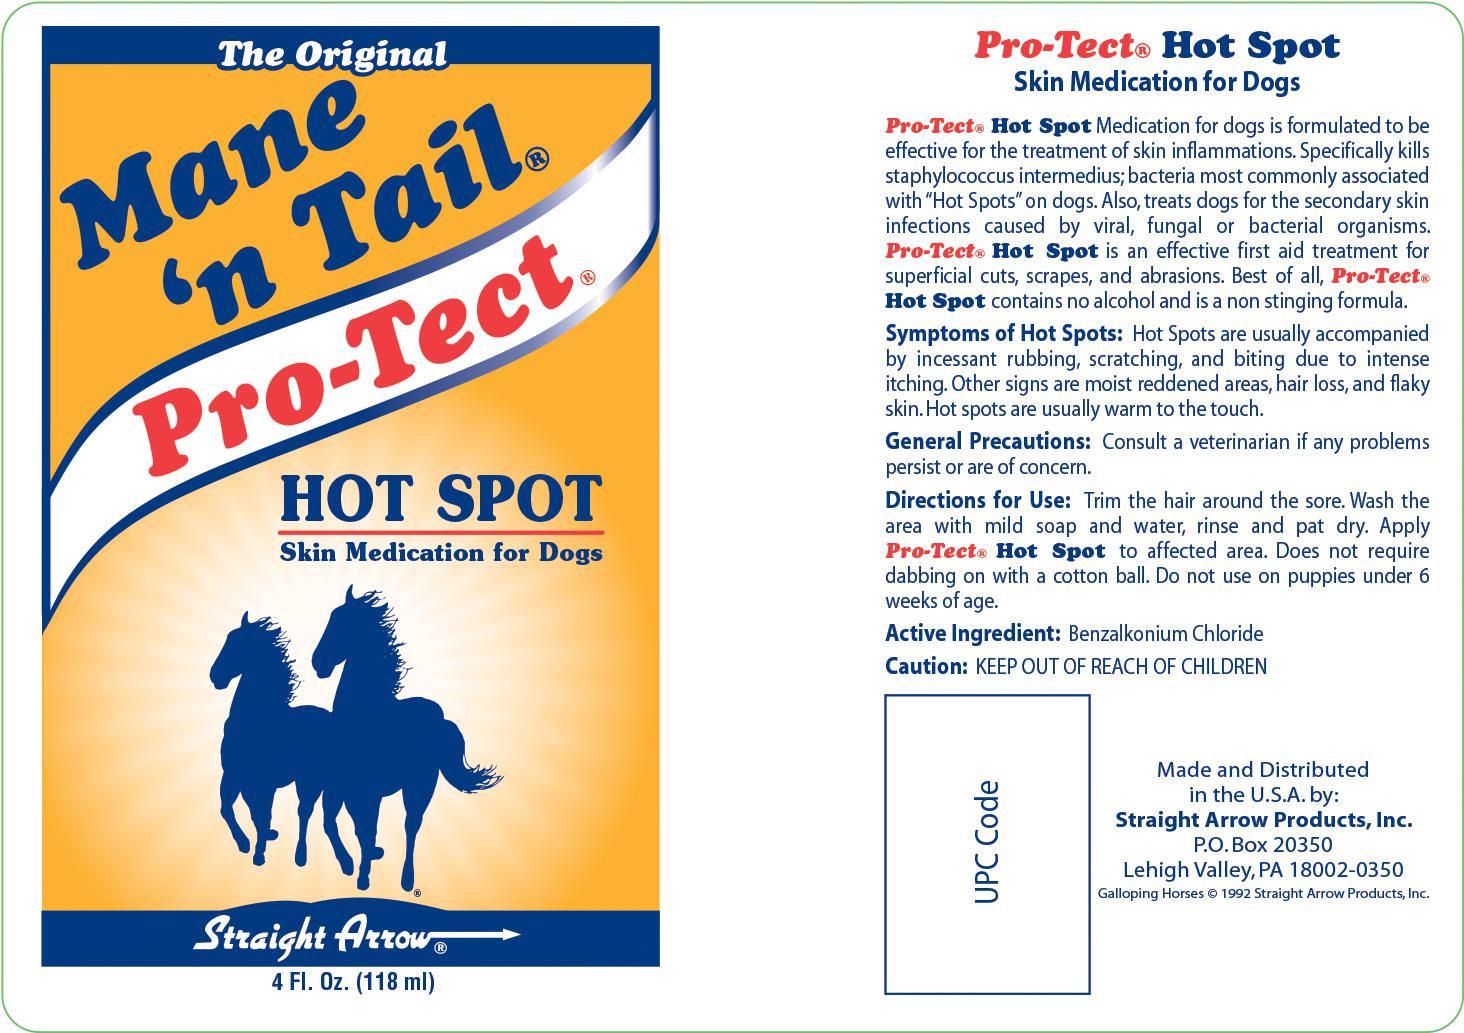 Pro-Tect AM Hot Spot Label